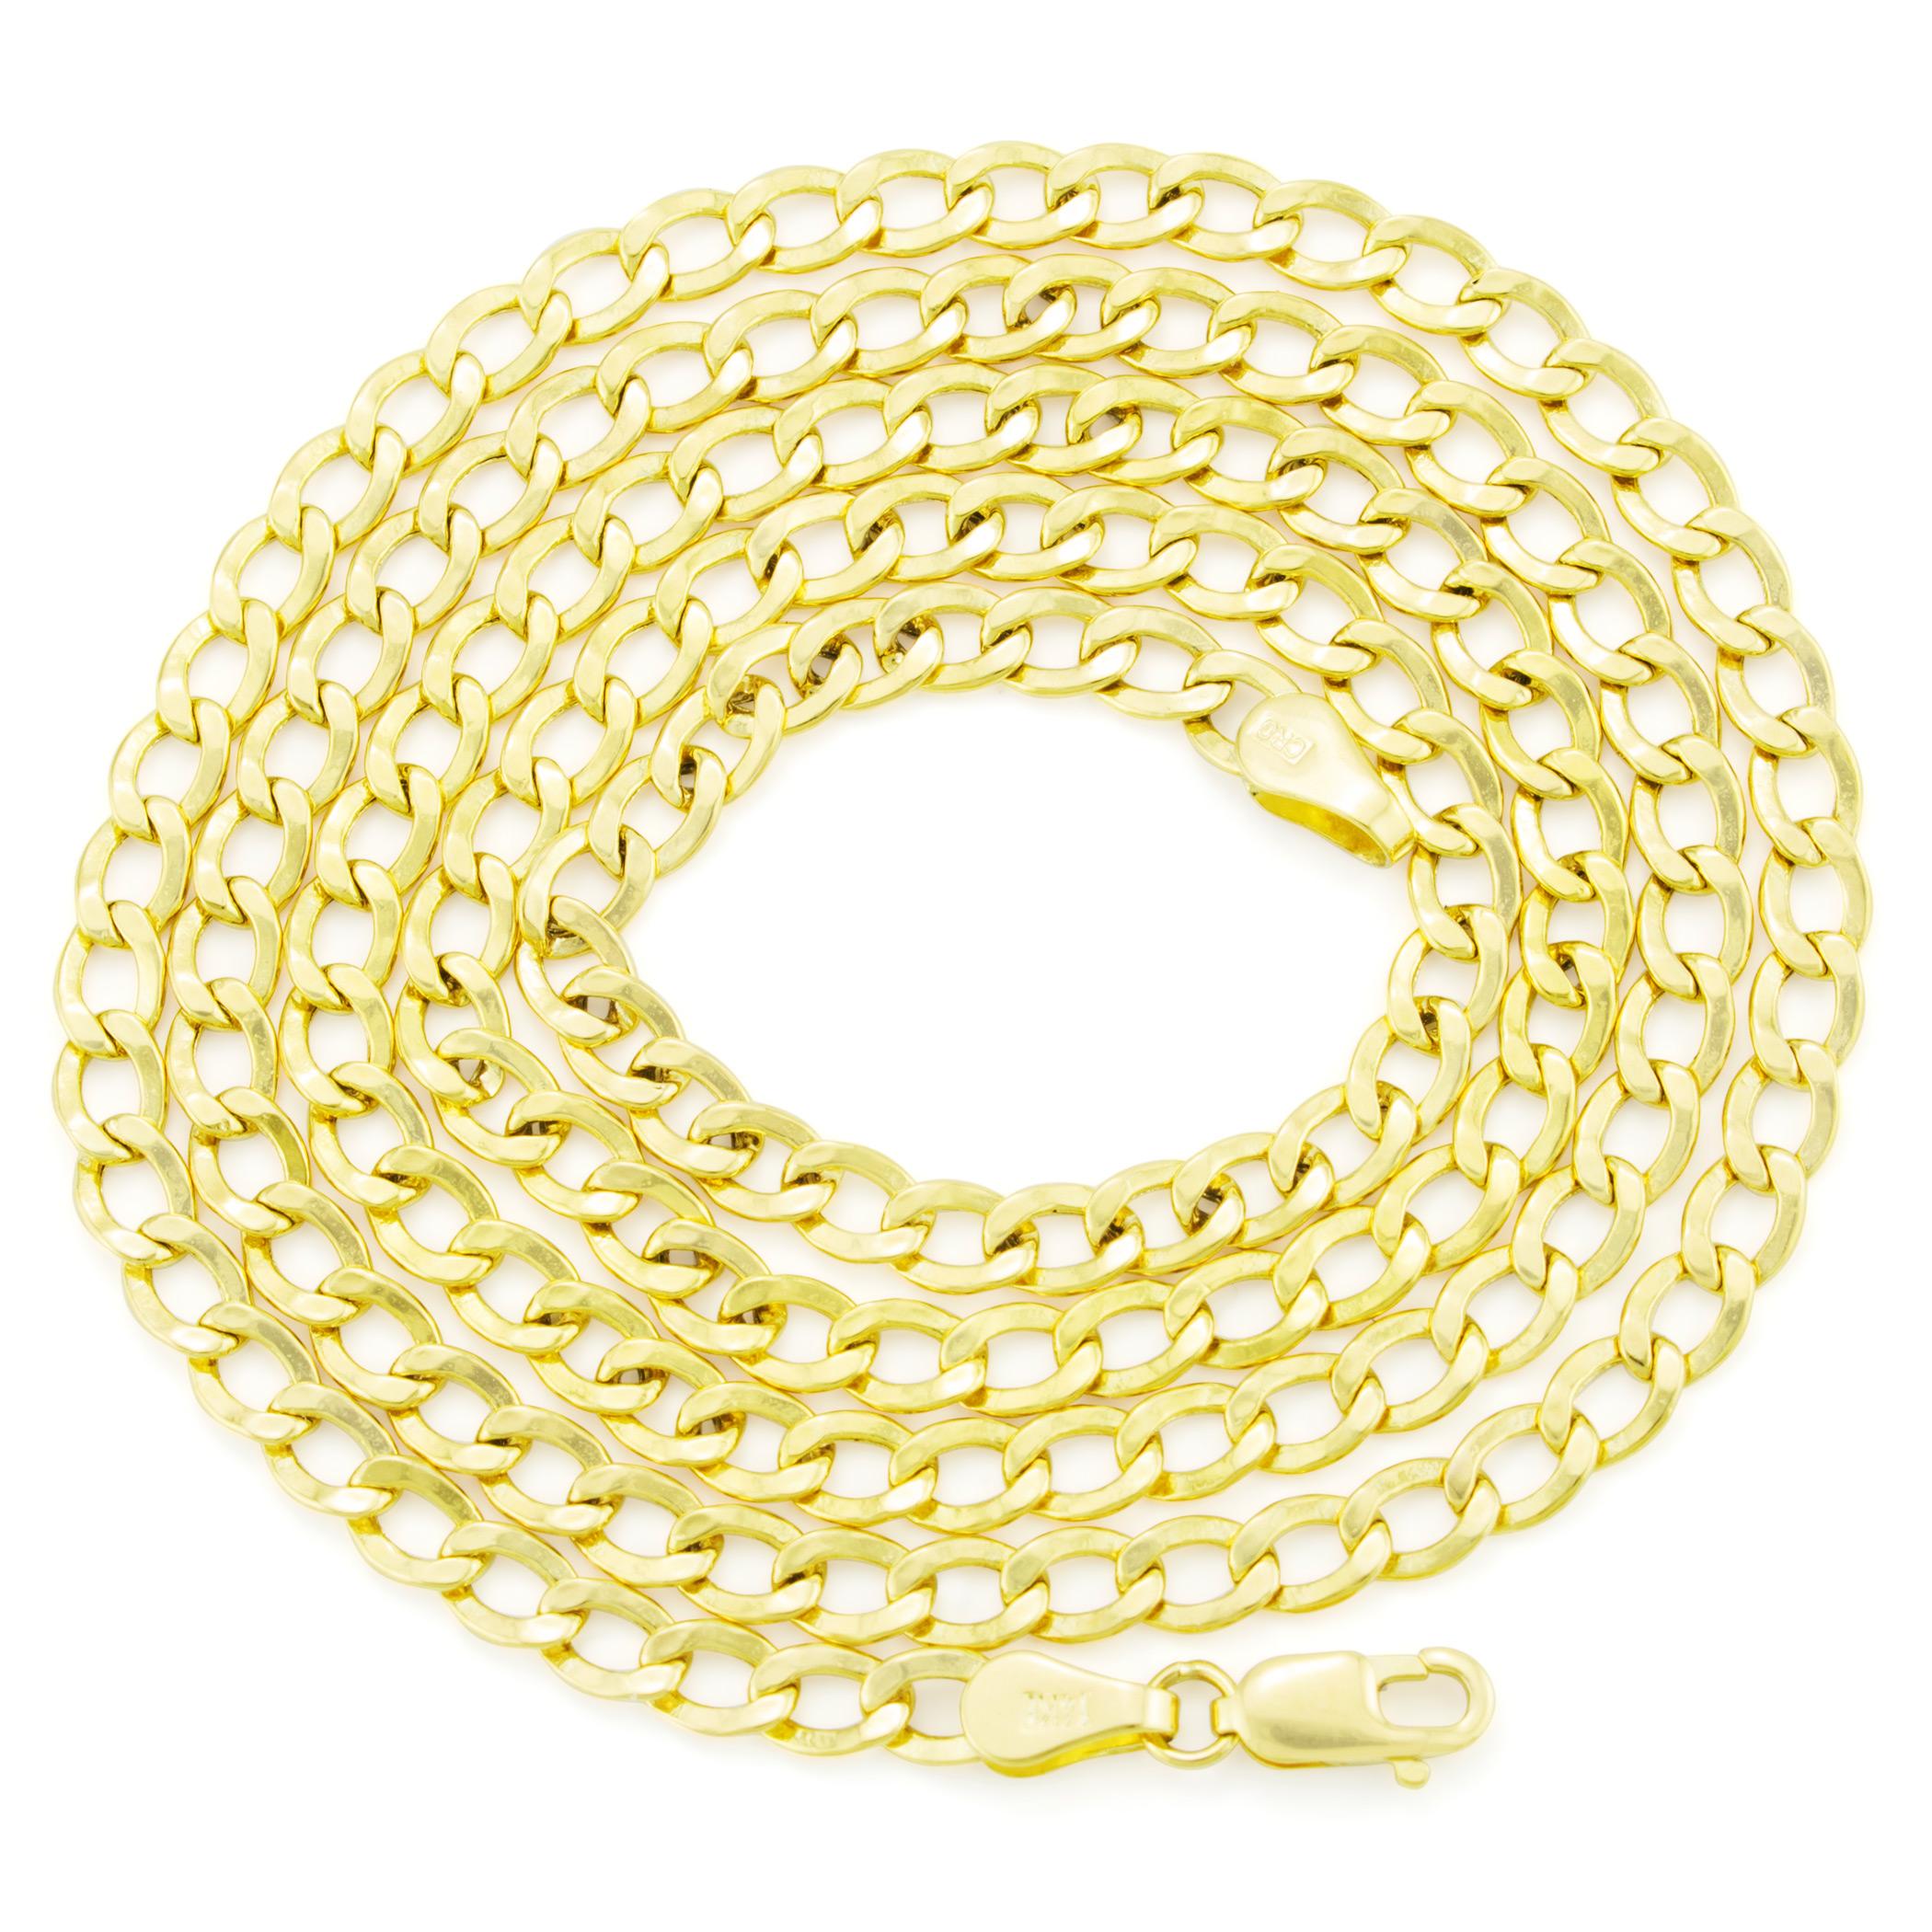 14K-Yellow-Gold-3-5mm-Women-Curb-Cuban-Chain-Link-Bracelet-Anklet-Chain-7-034-8-034-9-034 thumbnail 20